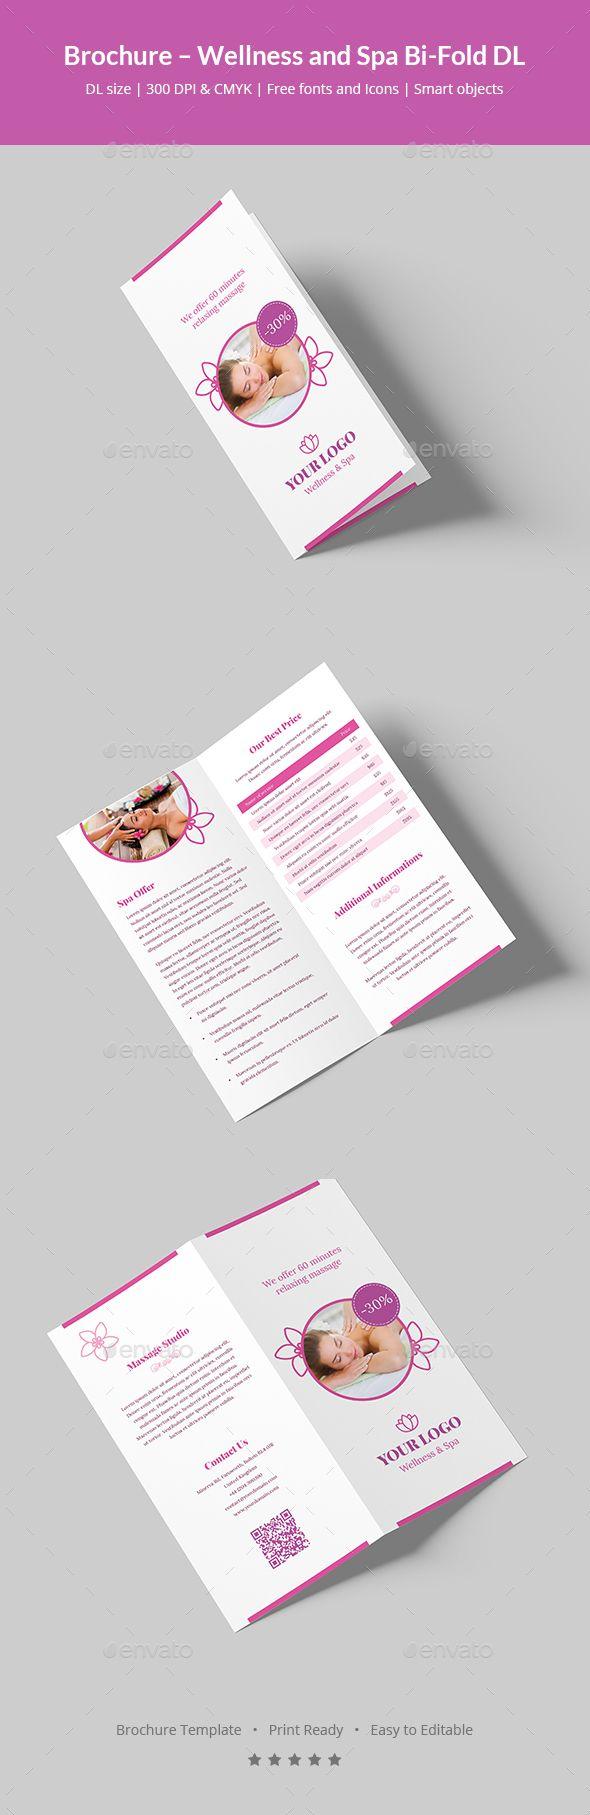 Brochure Wellness And Spa Bi Fold Dl Flyer Template Psd Brochure